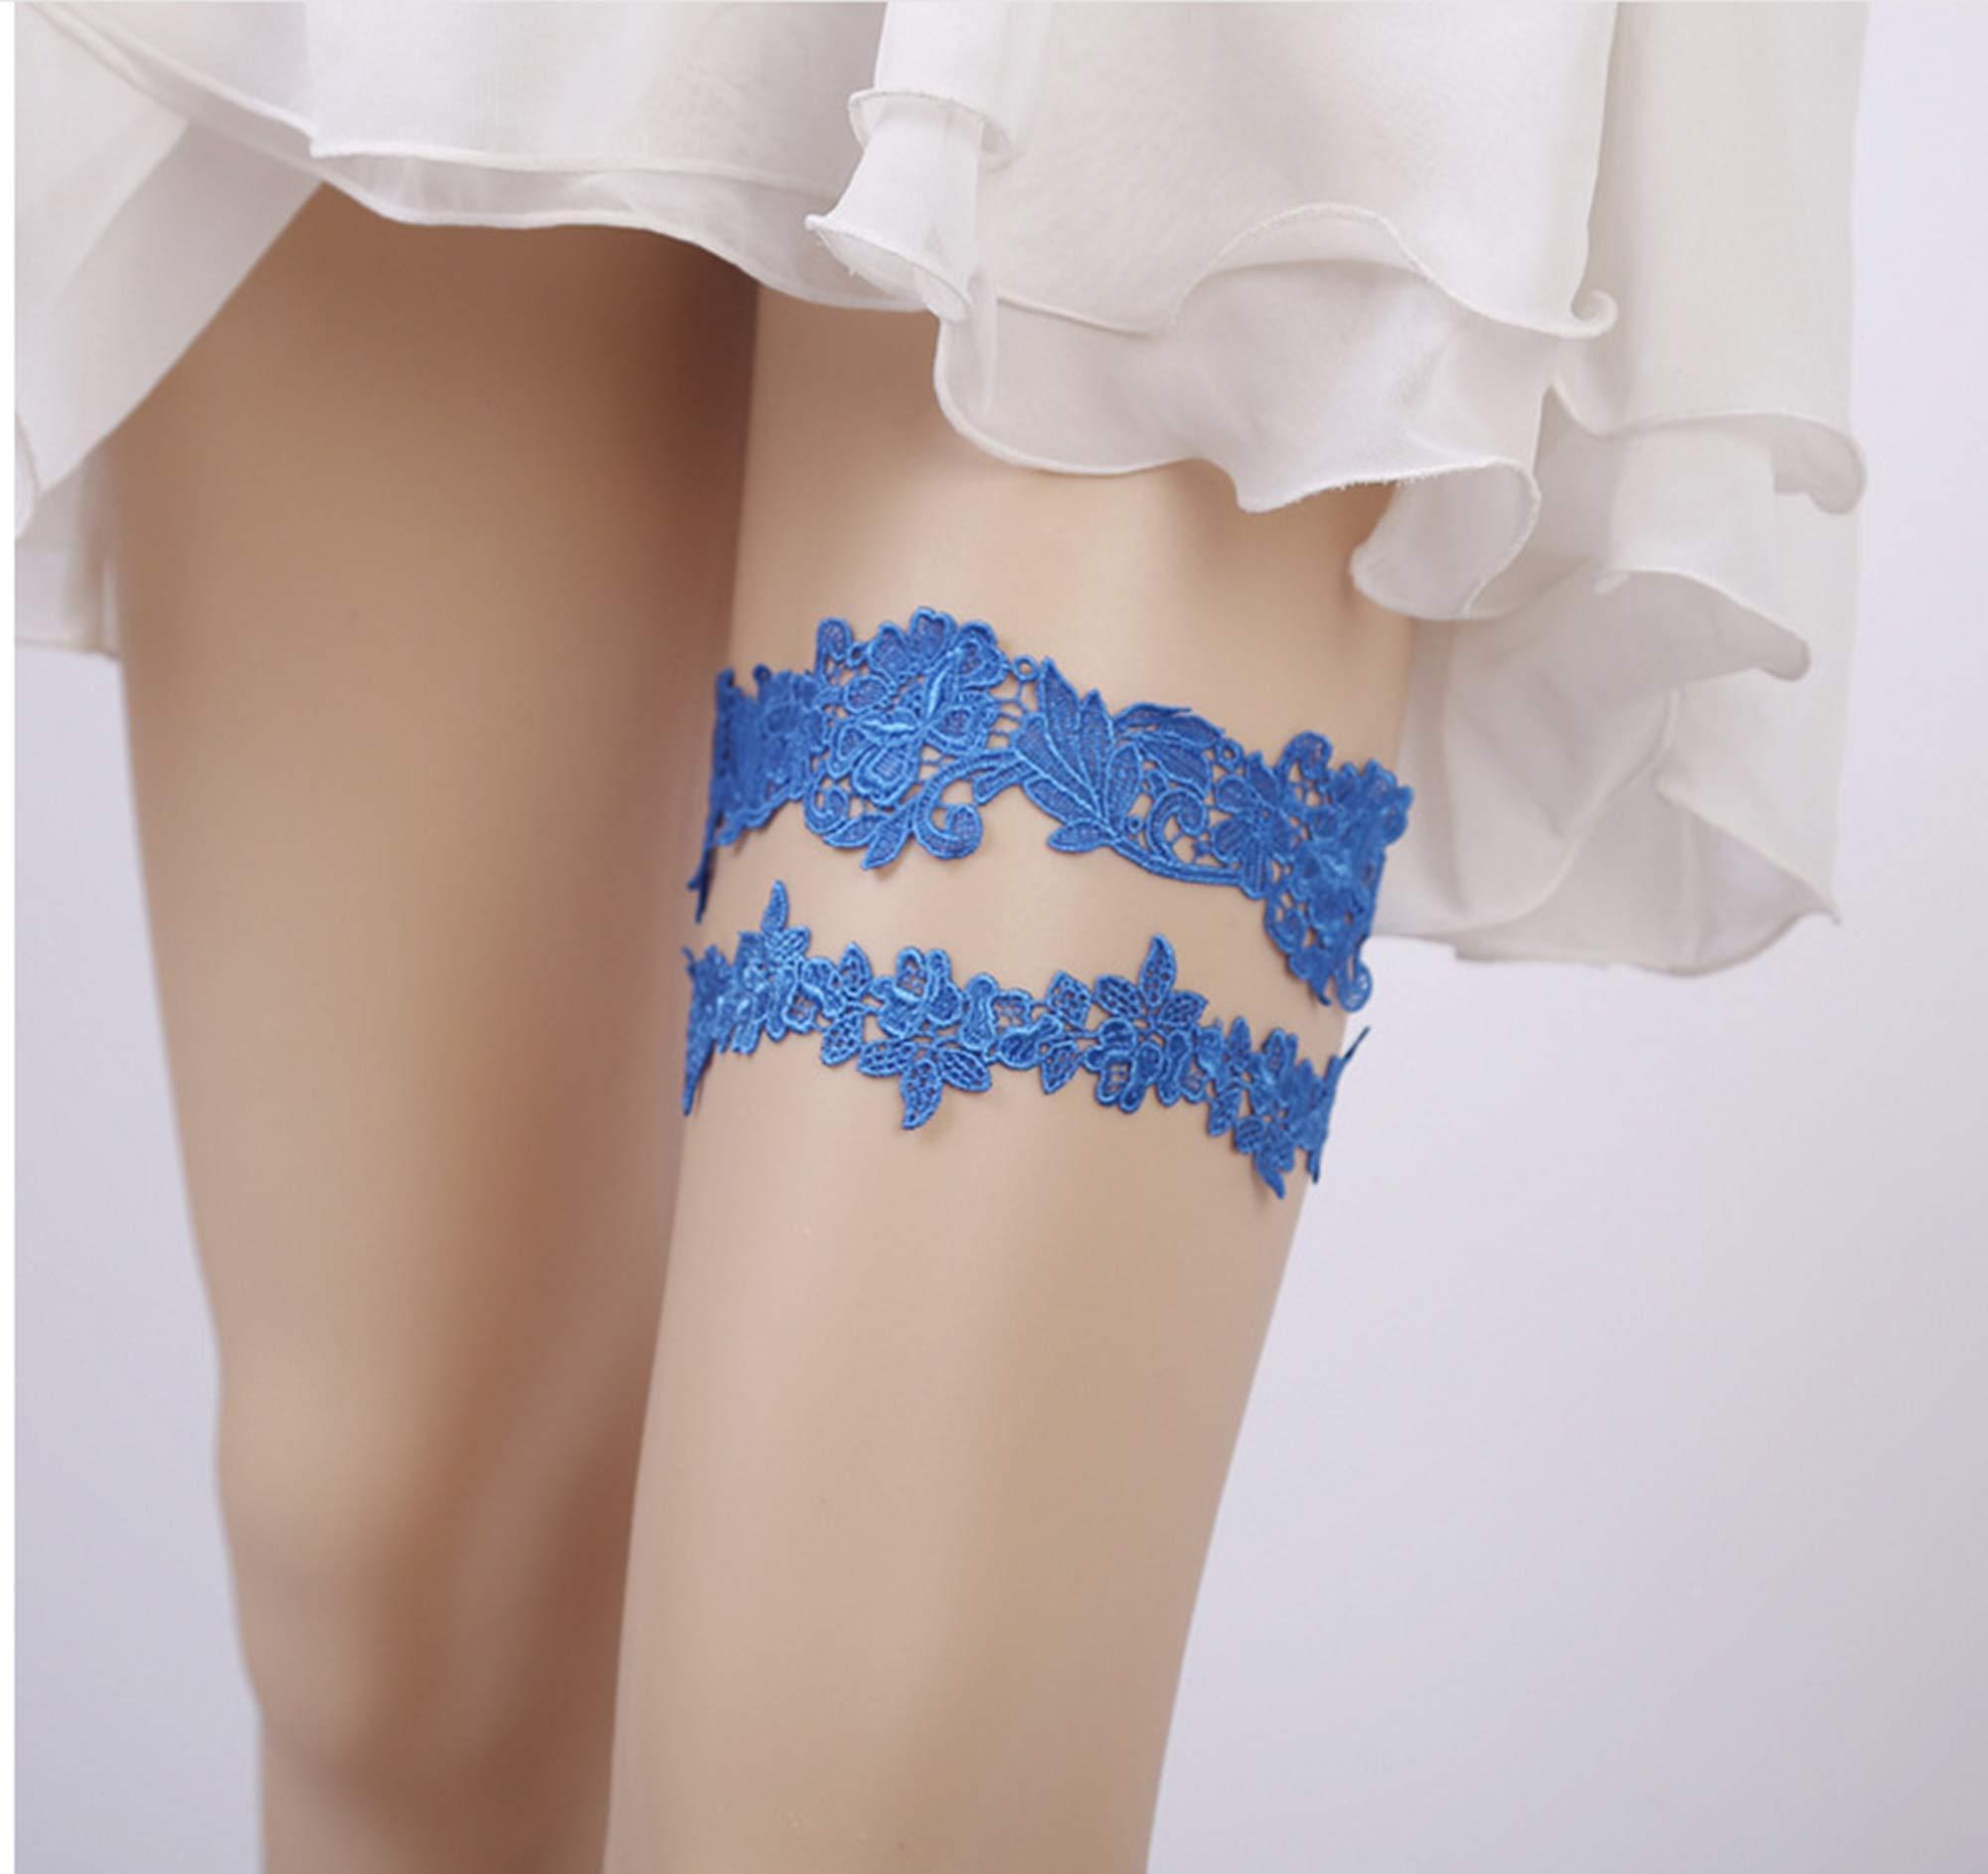 WINCSPACE Handmade Lace Crystal Applique Wedding Garter Belt Set Bridal Leg (colour7)